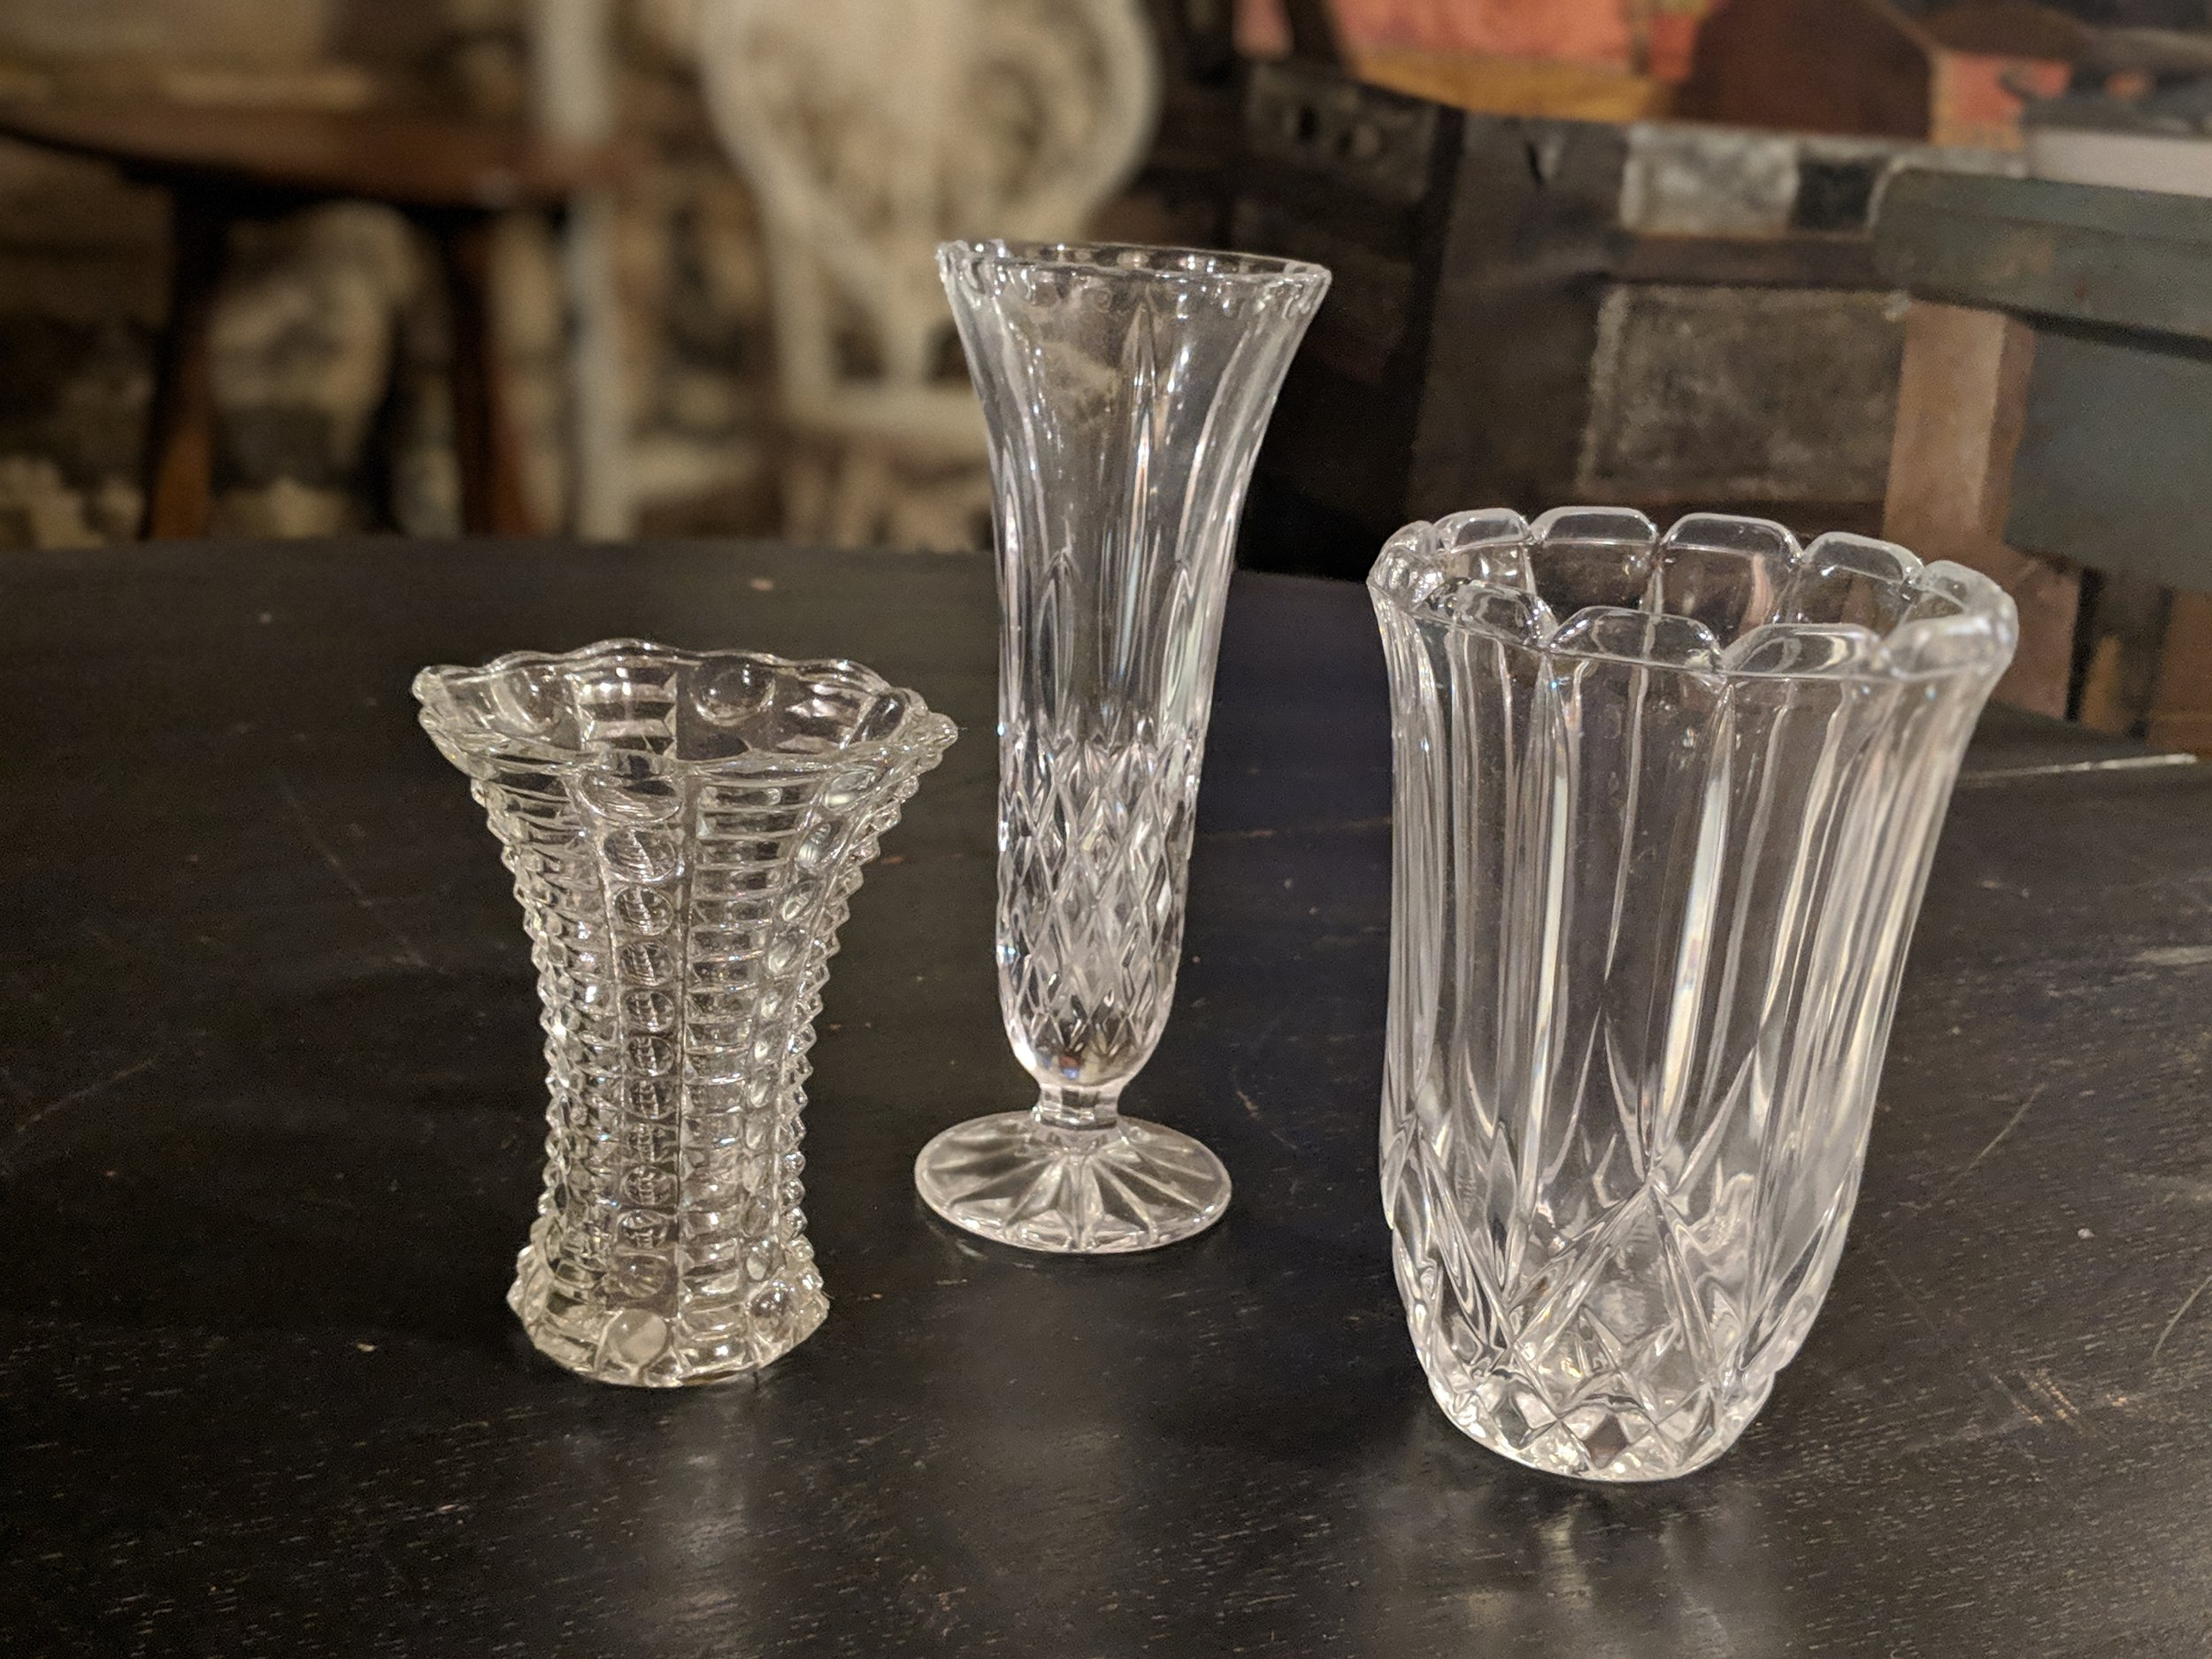 glass vases barn wedding decor